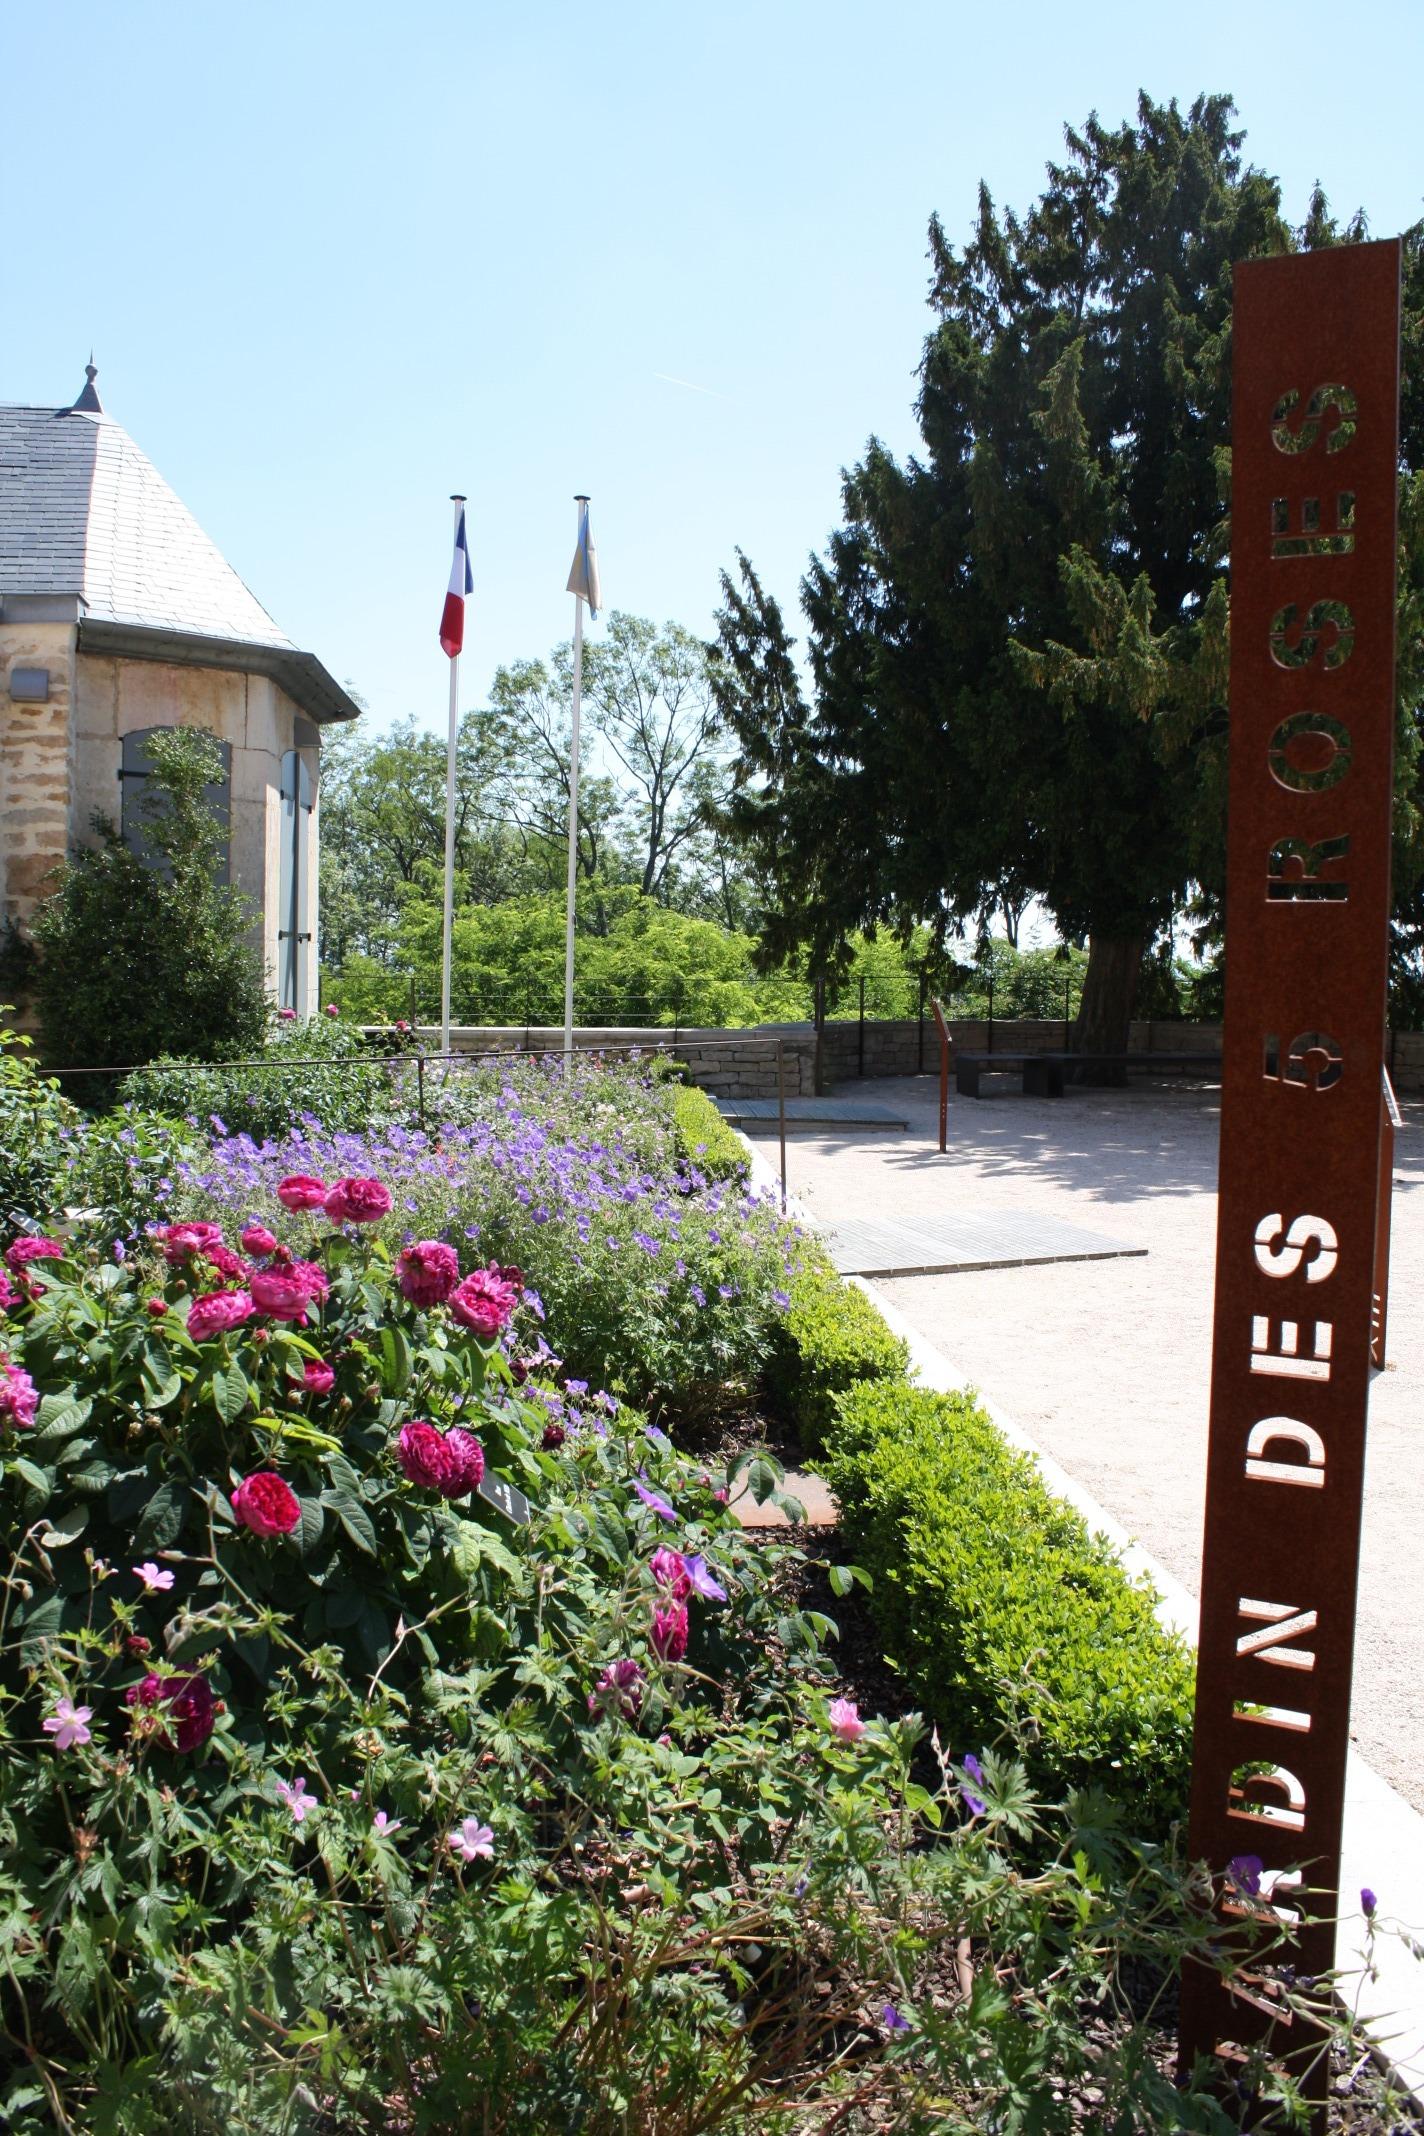 Le Jardin des 5 Roses